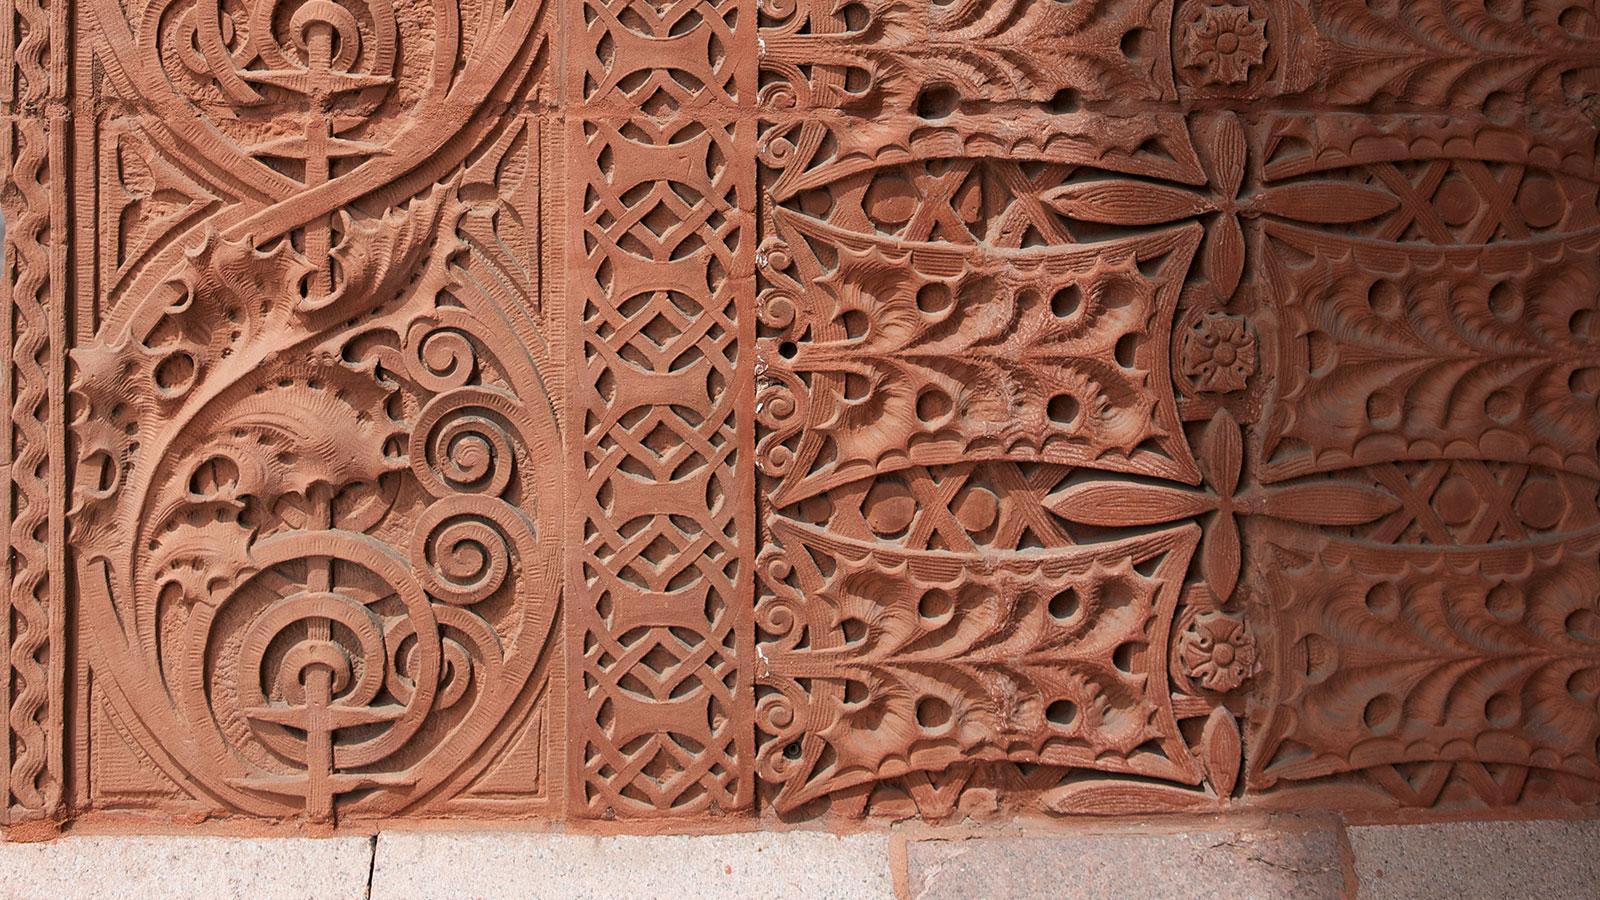 ornament in architecture louis sullivan - 100 images - louis sullivan architecture design visual ...